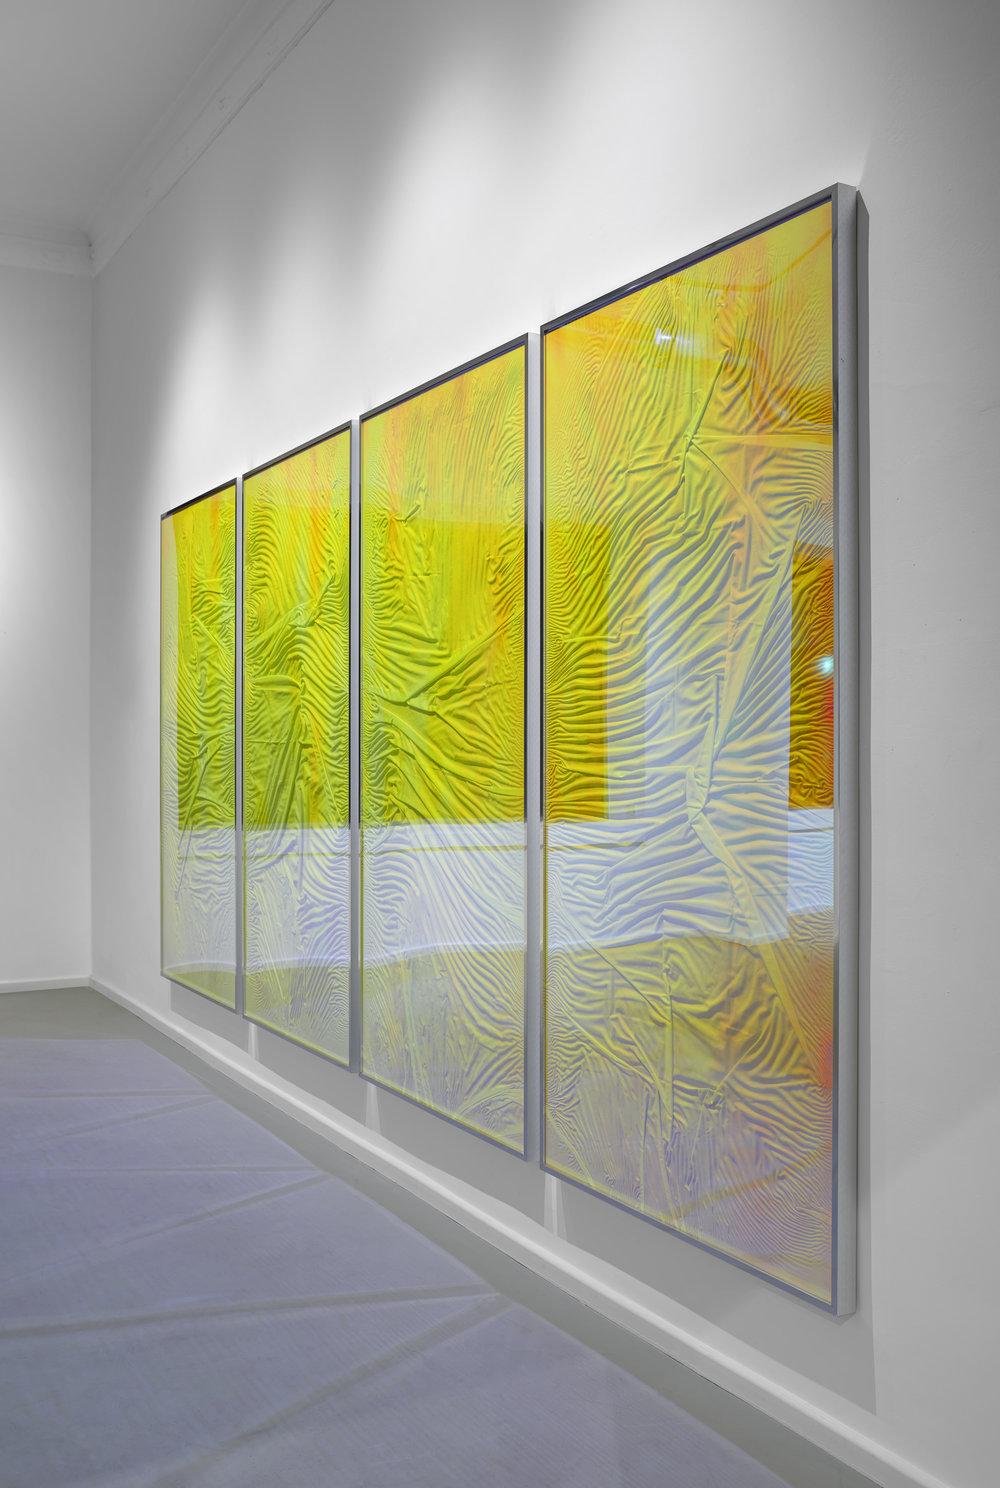 L'apparition / Part IV, V, VI, VII (Quadriptych),  2014 - Side view Linen on wood beneath Radiant Plexiglas, aluminium frame structure 400cm x 200cm (157 x 79 in)